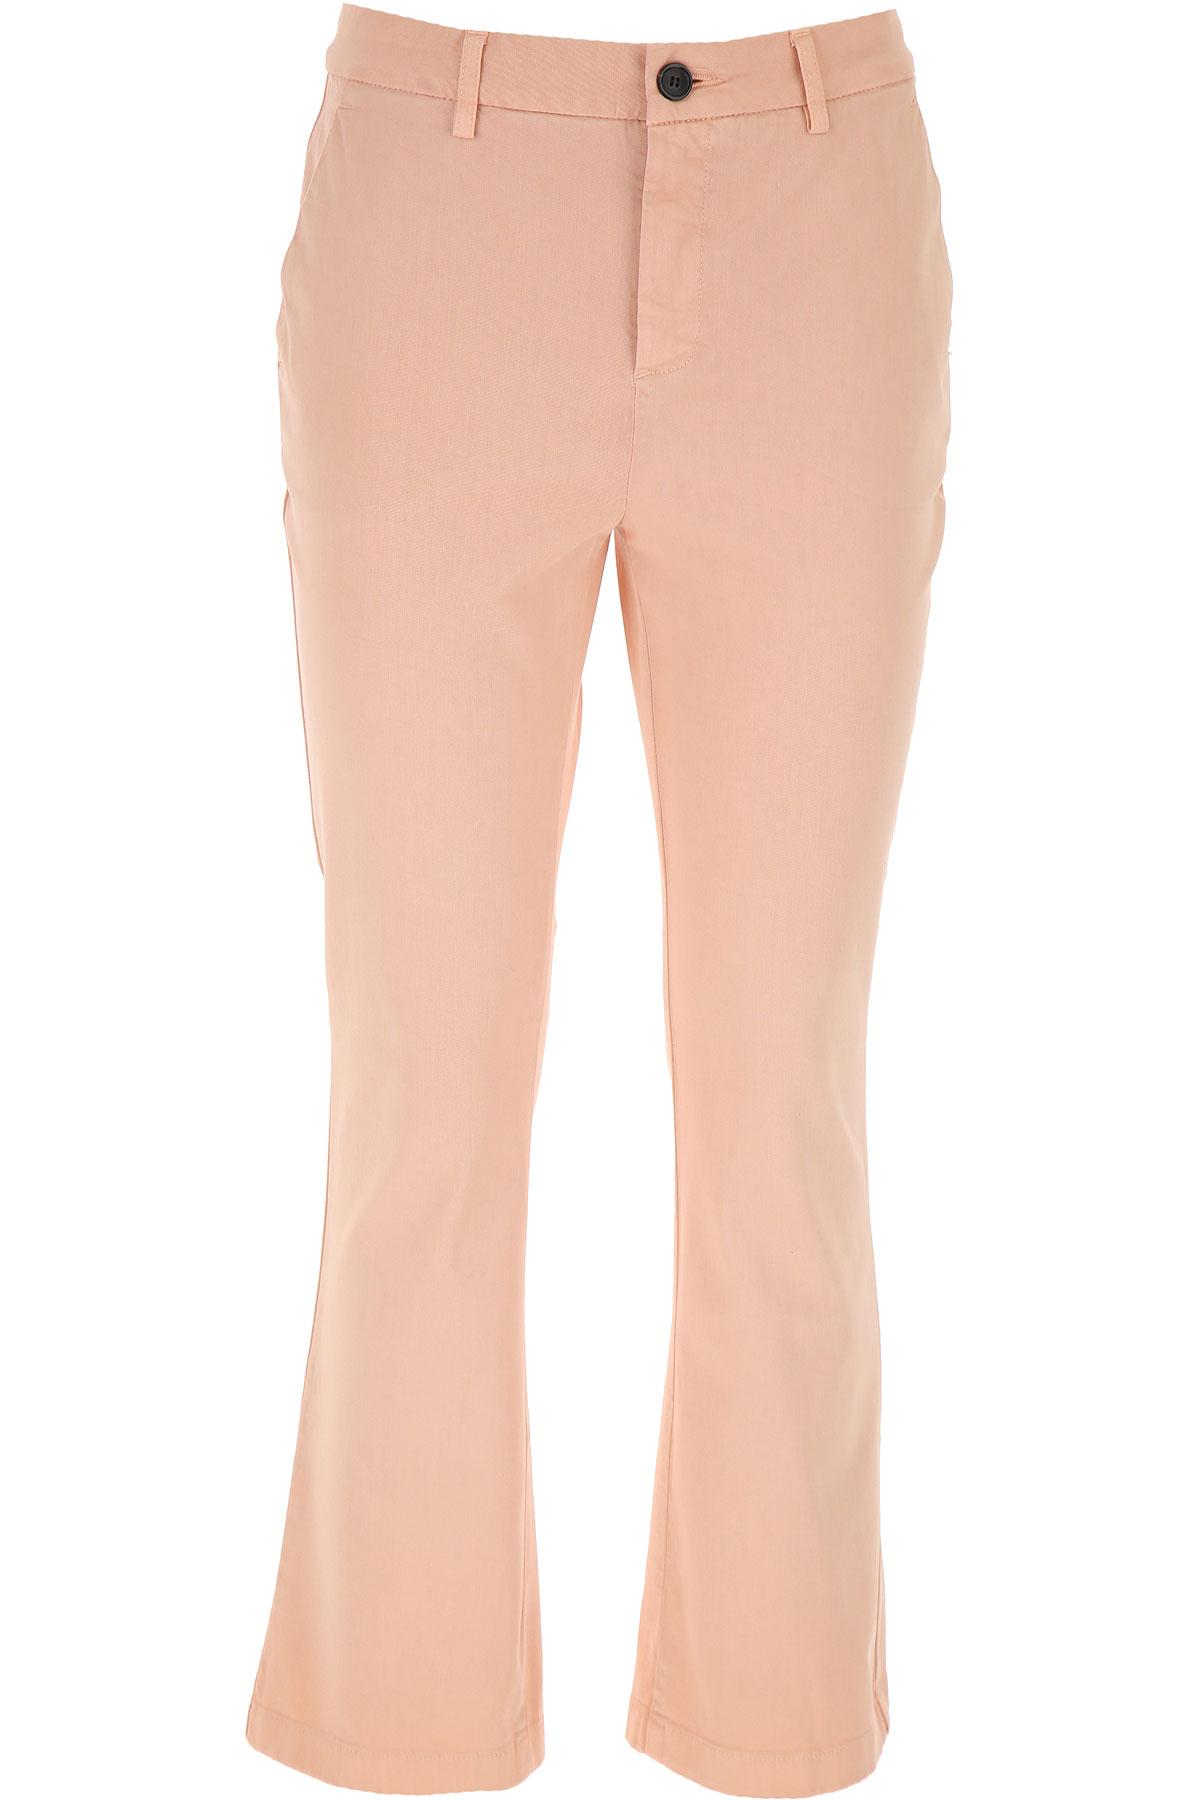 Department Five Pants for Women On Sale, Powder Pink, Cotton, 2019, 26 27 28 29 30